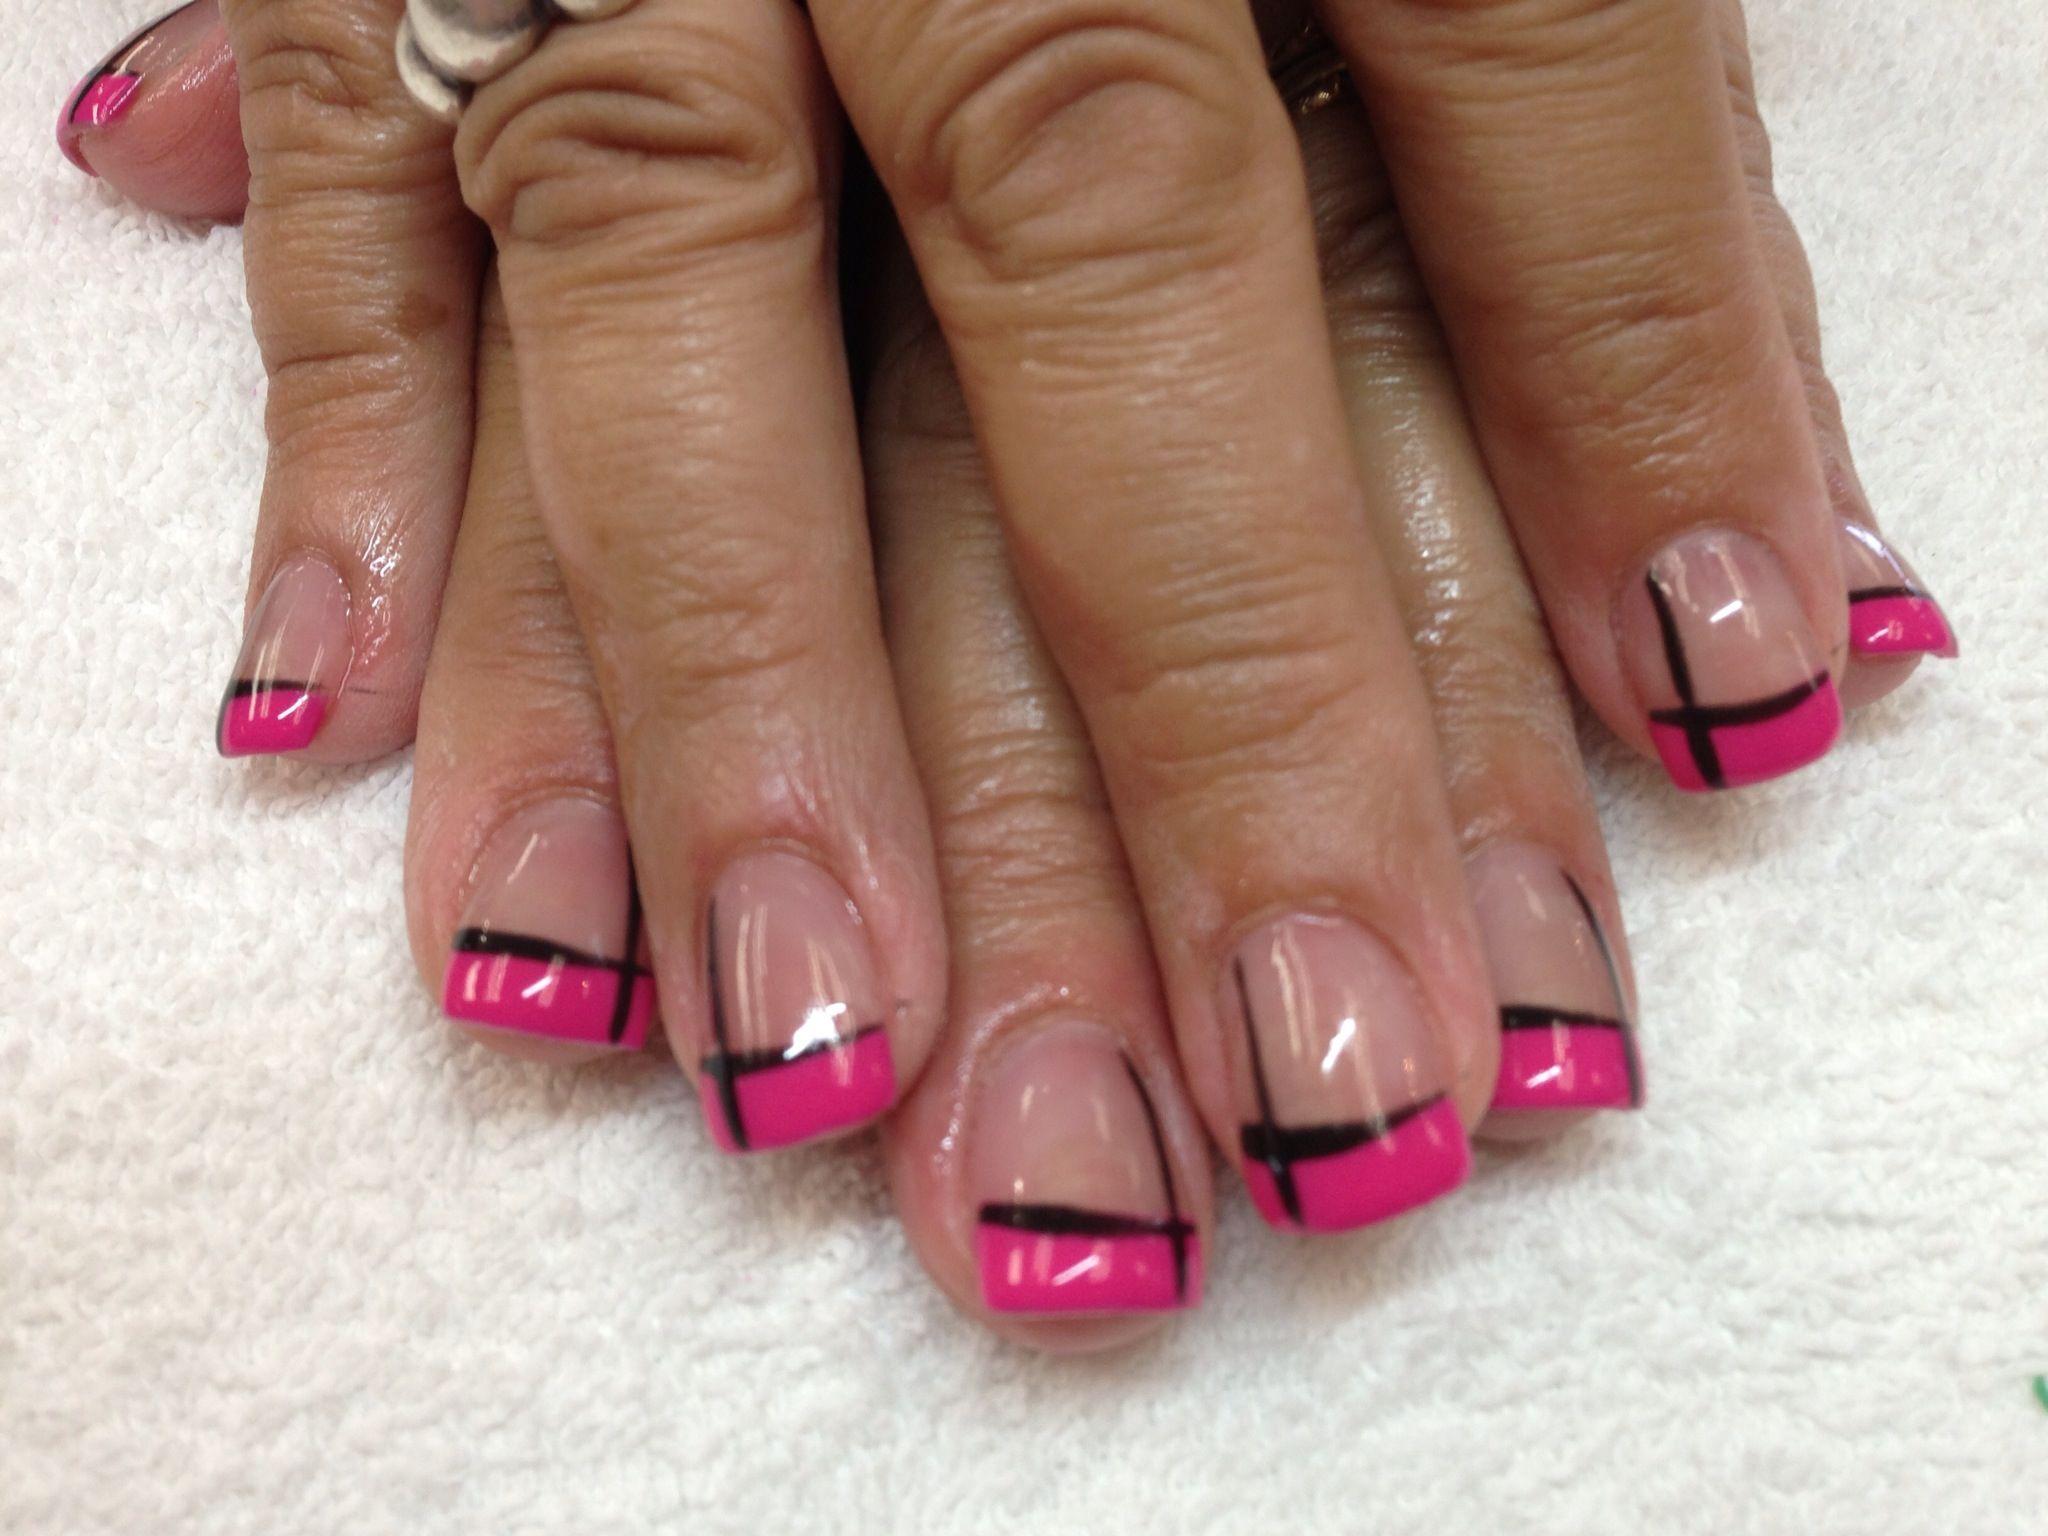 Luxio gel polish in Devine | Nails by Sheri/Sculpture Salon ...